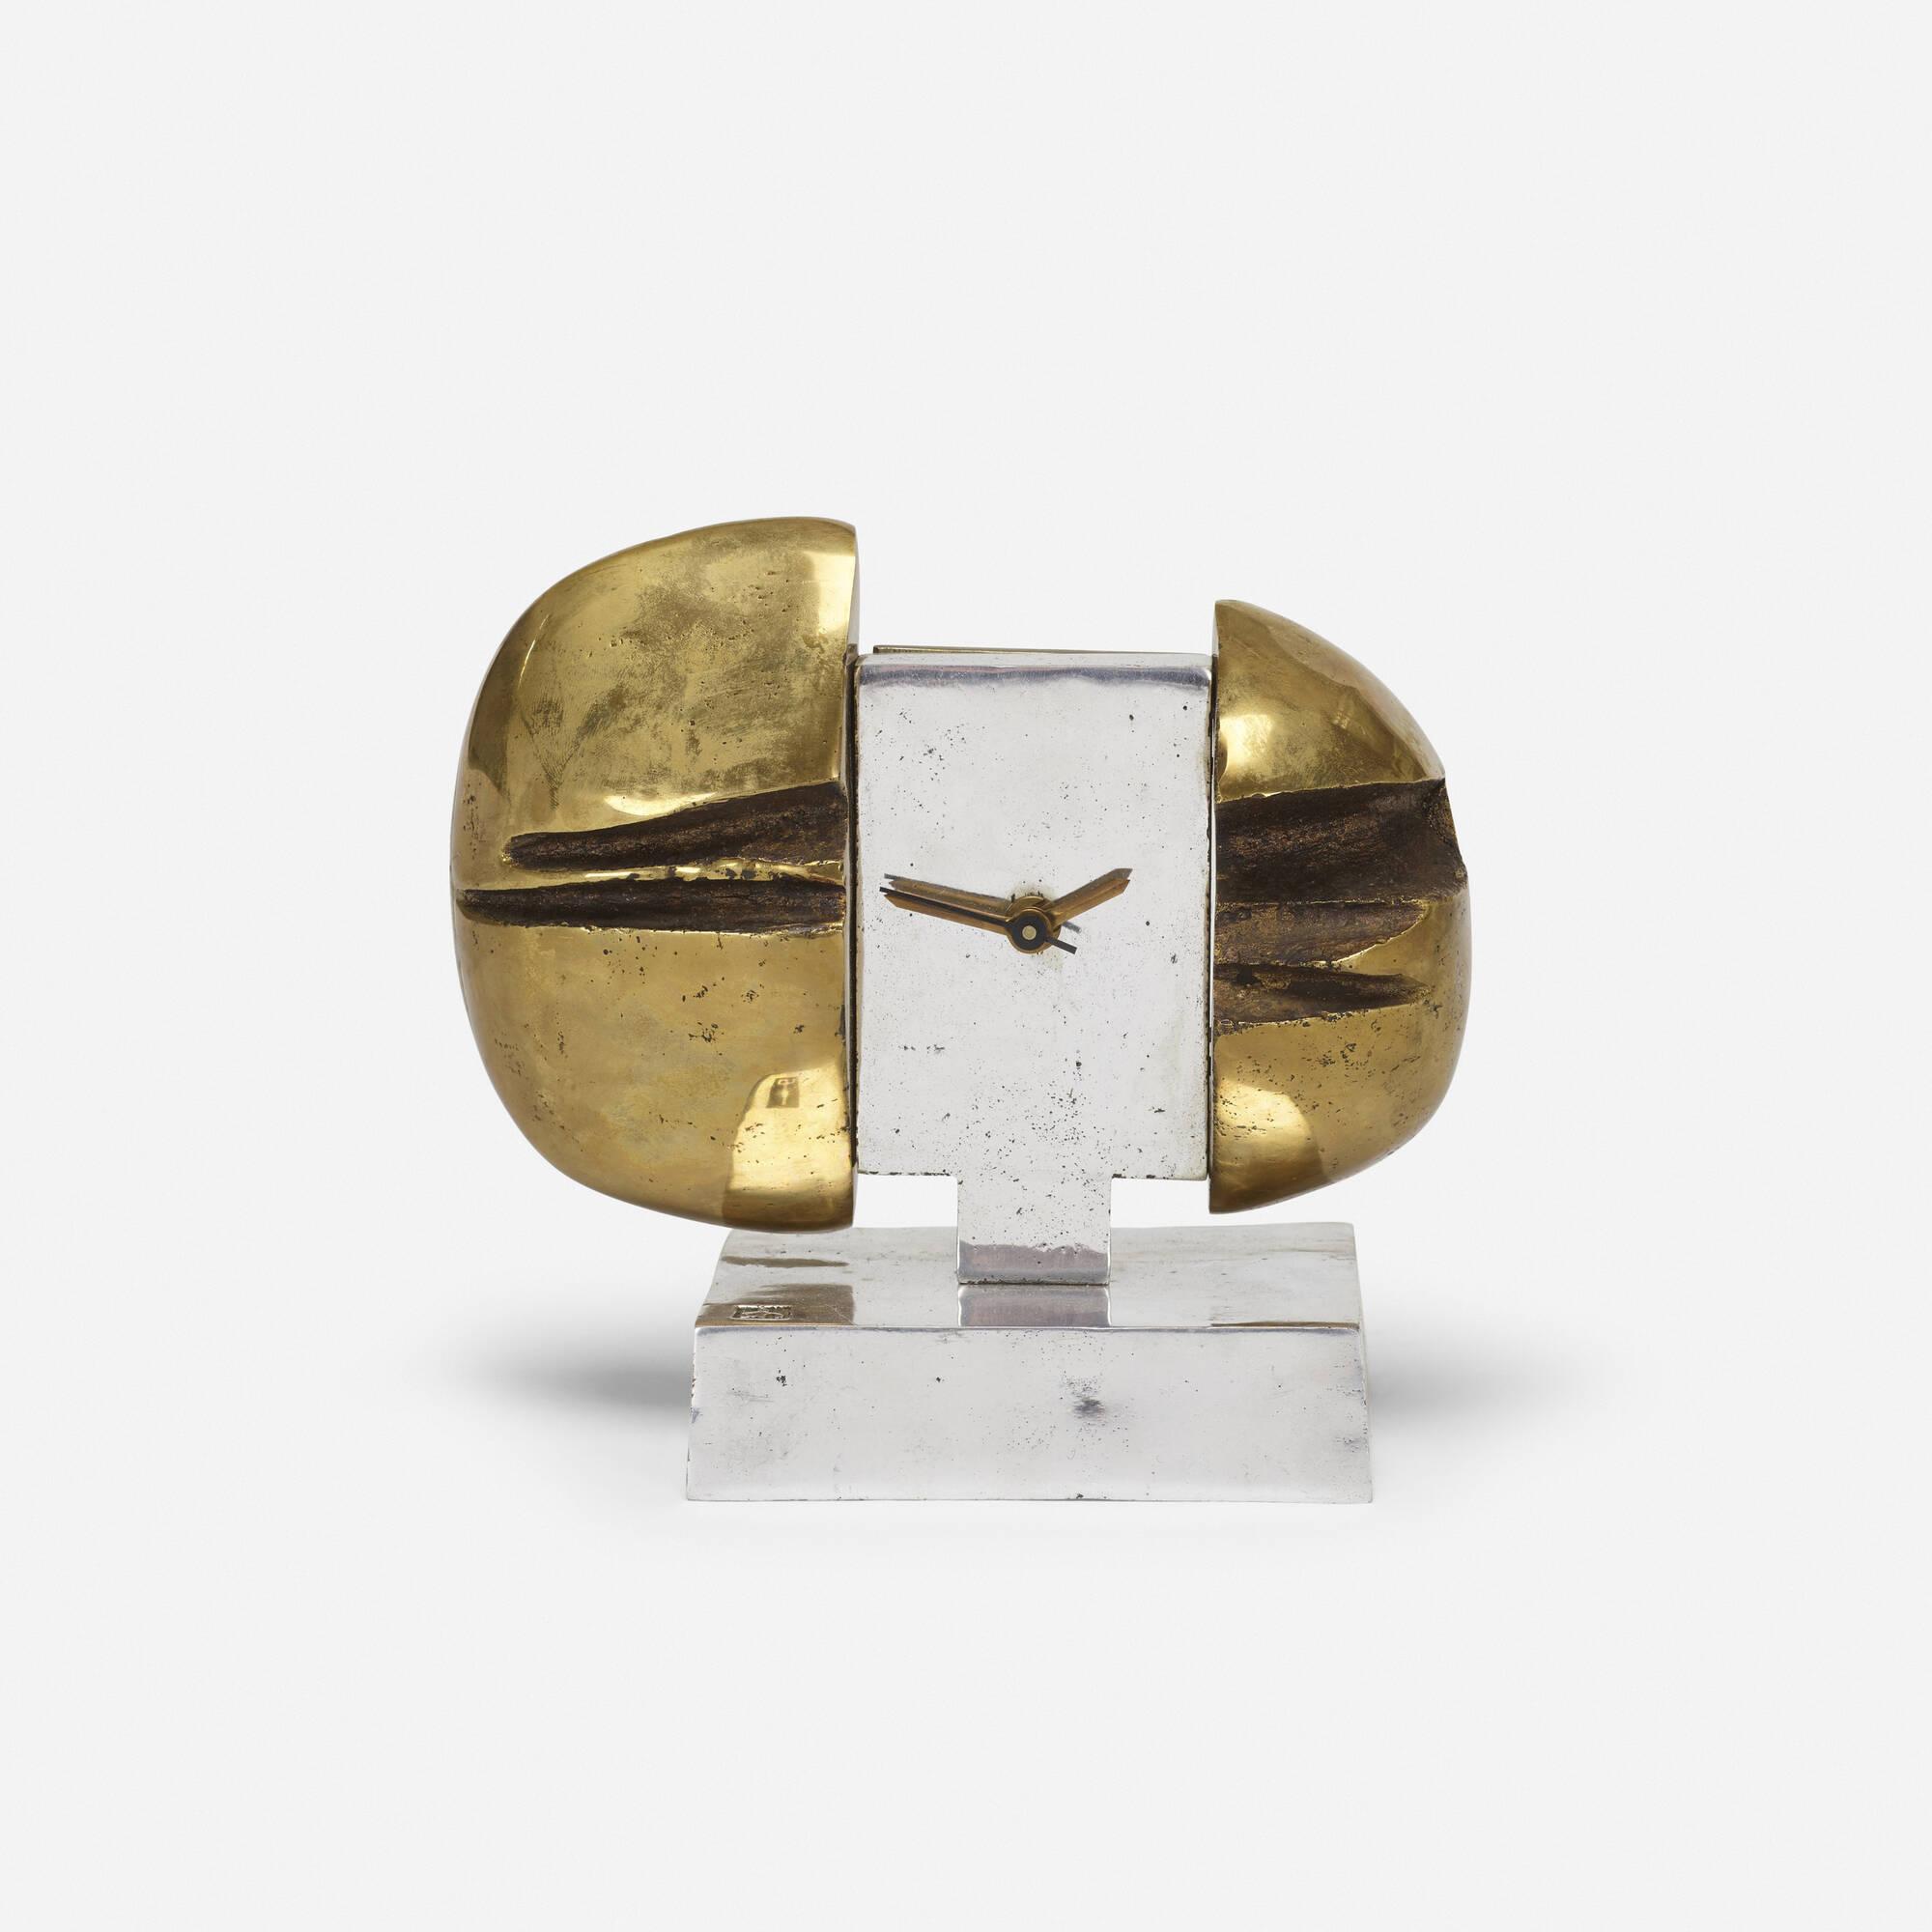 536: David Marshall / clock (1 of 2)